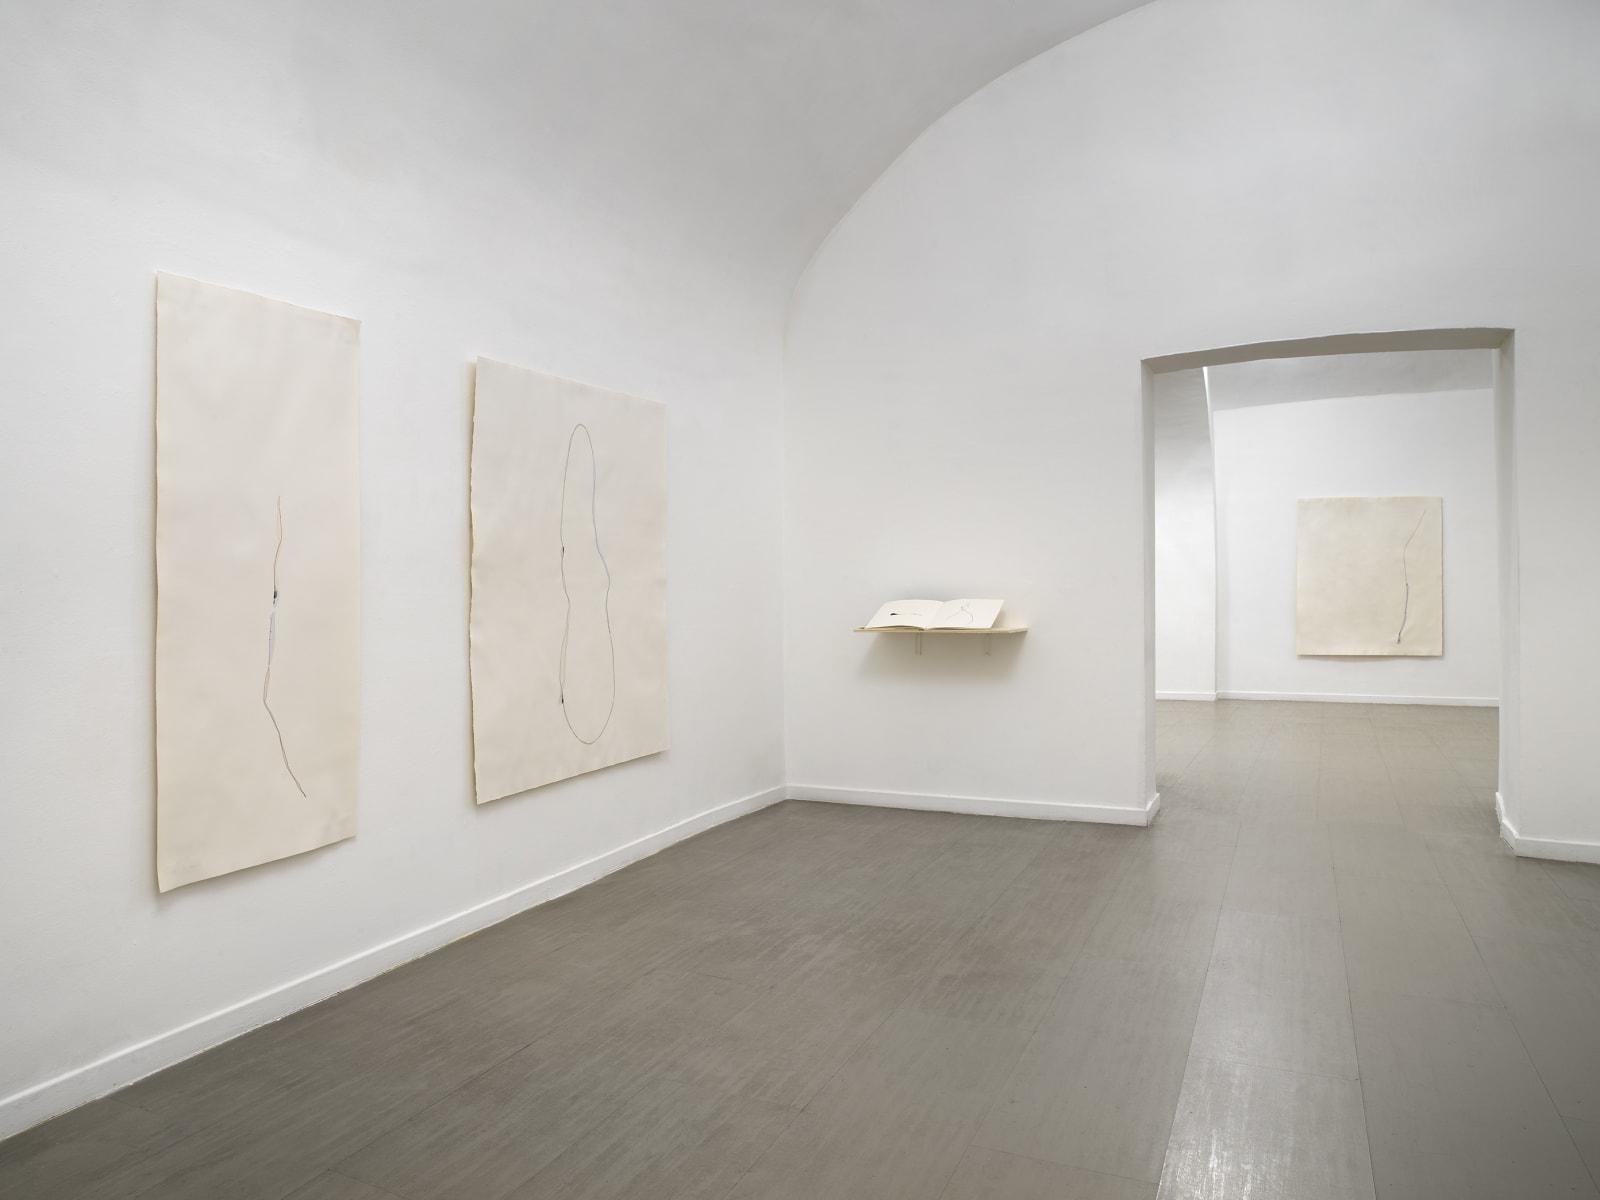 Beatrice Pediconi Nude curated by Cecilia Canziani installation view of the second and third room ph. Dario Lasagni